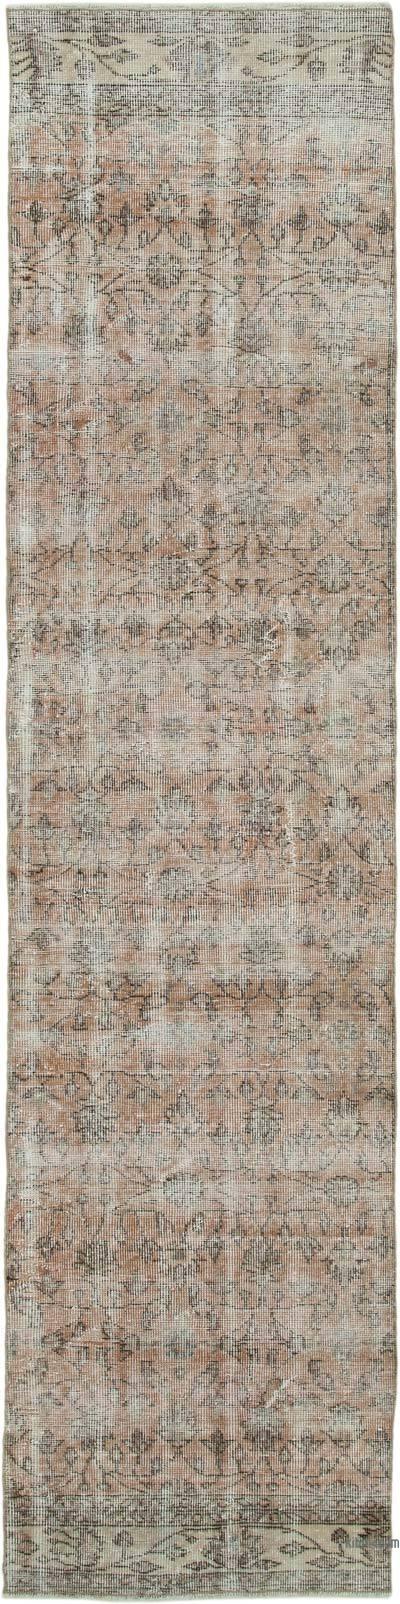 Alfombra Turca Vintage De Pasillo - 74 cm x 310 cm